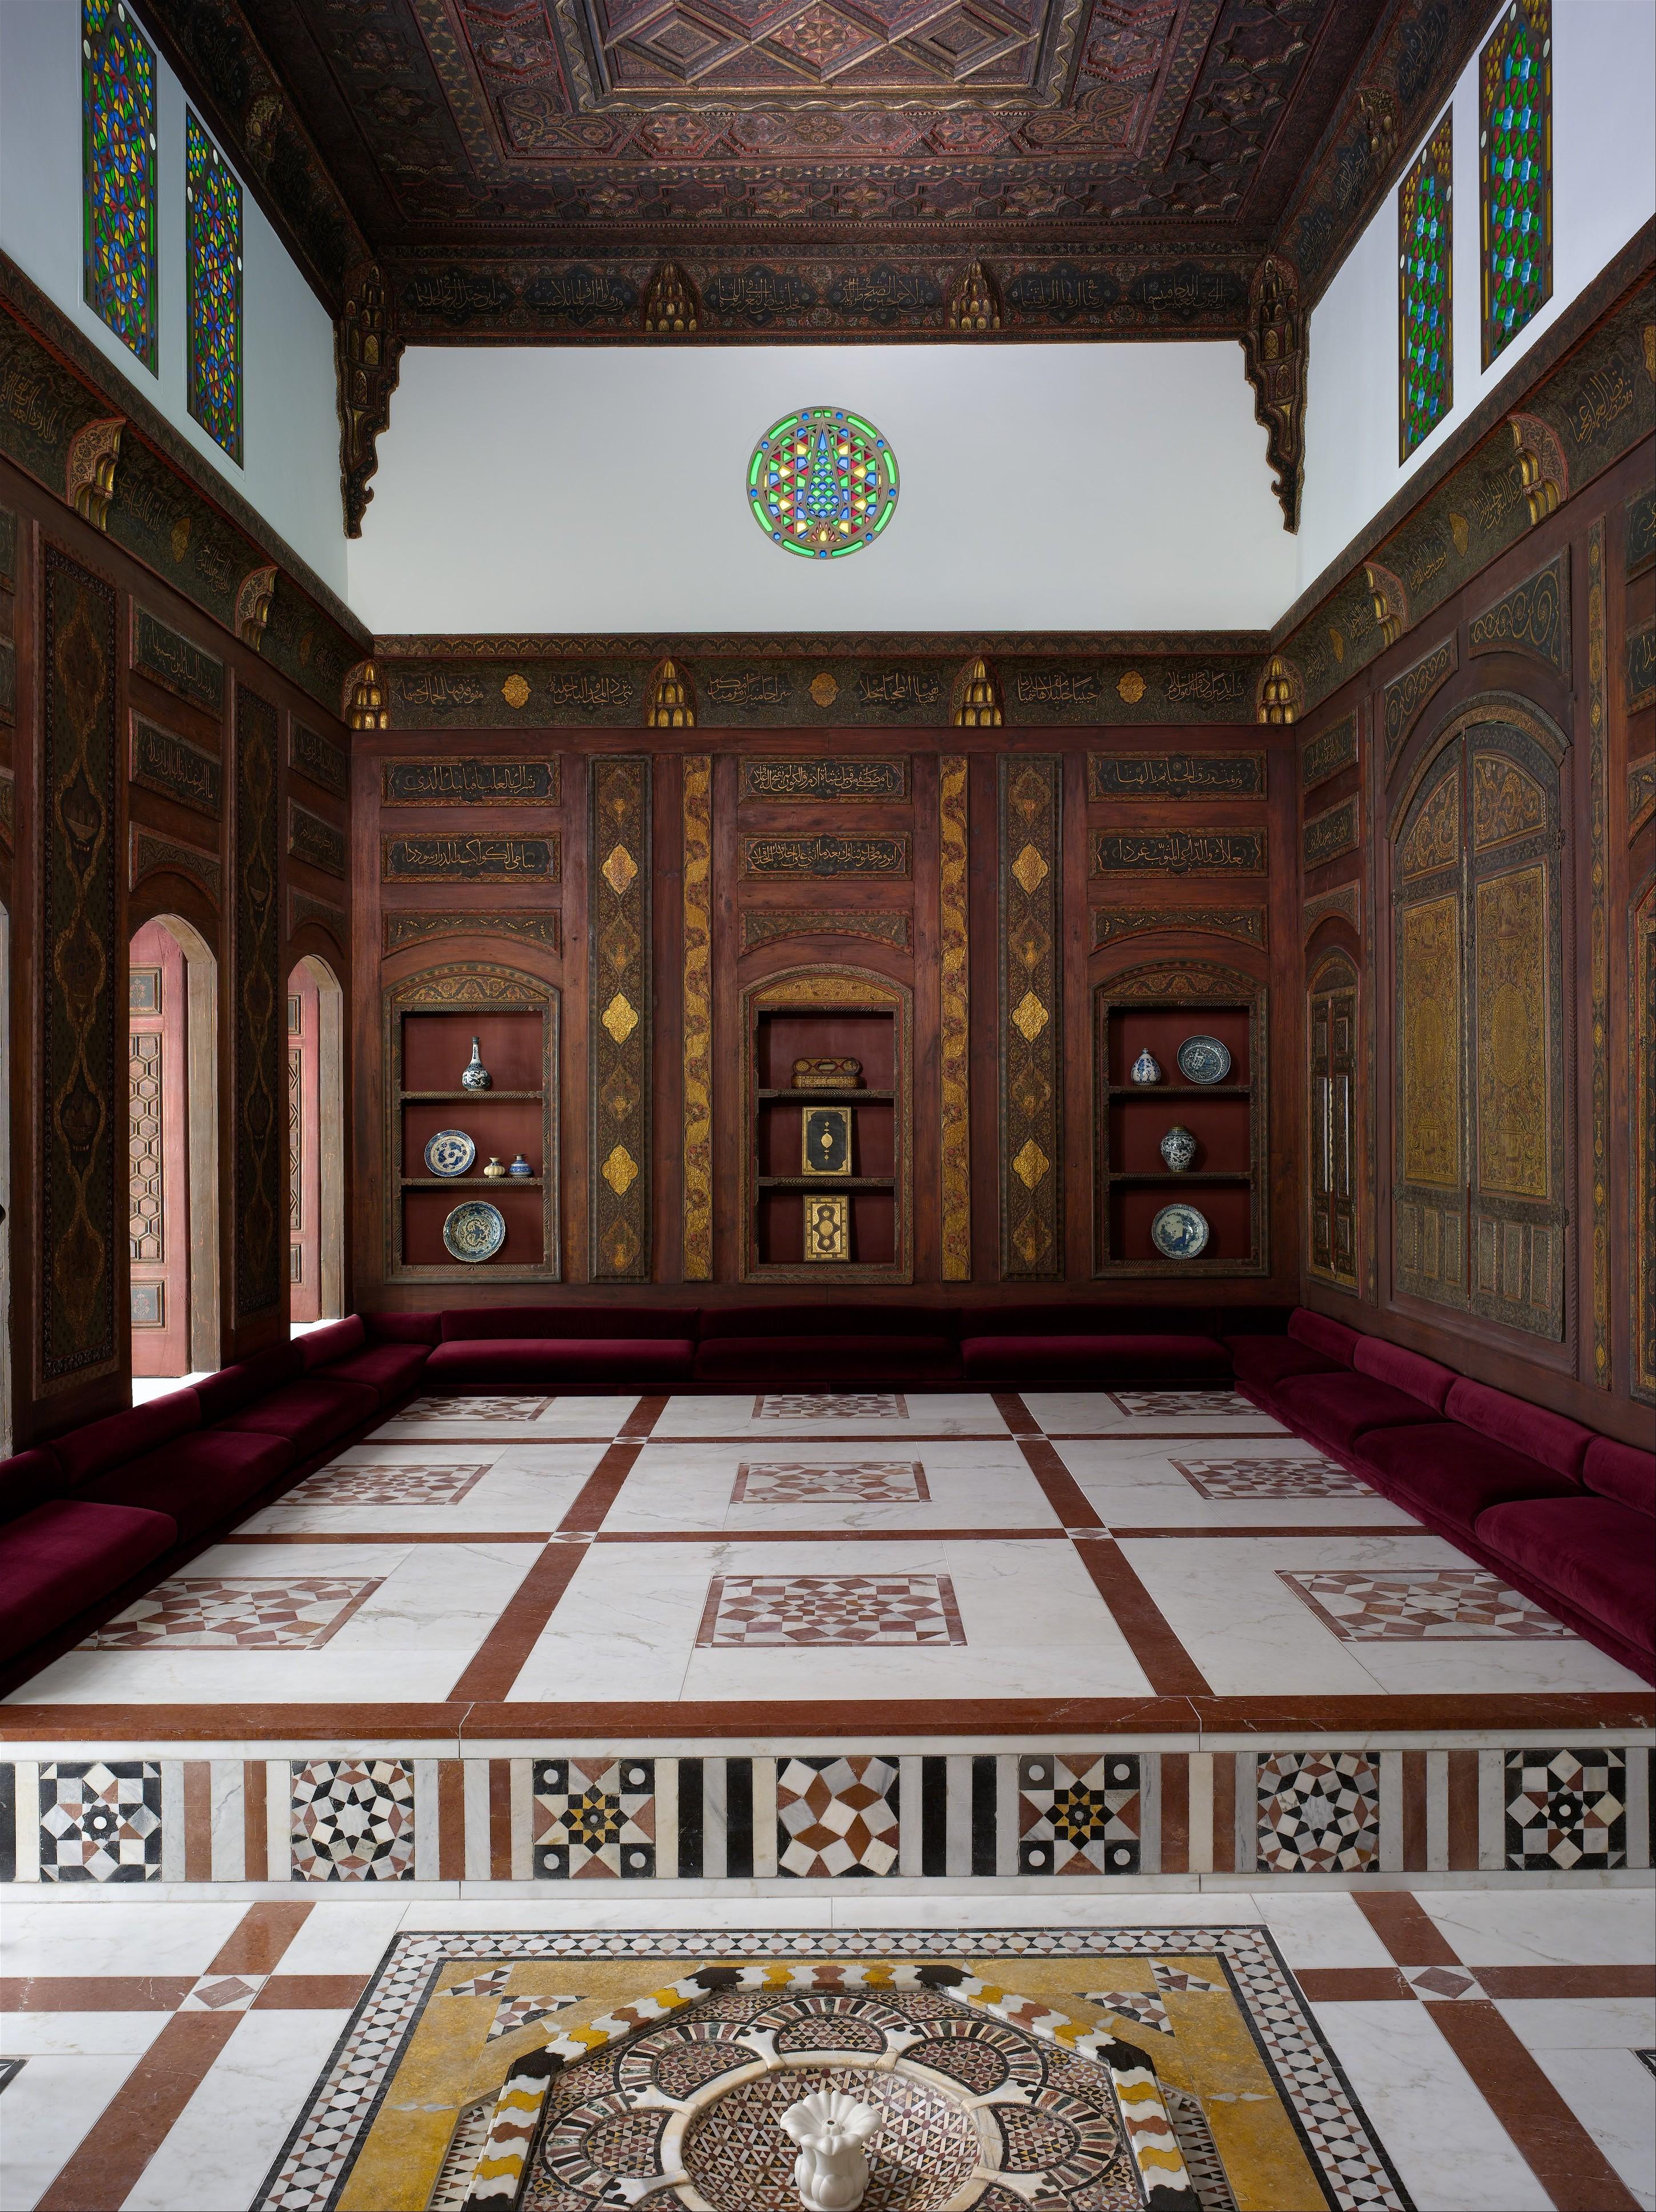 Damascus Room The Met